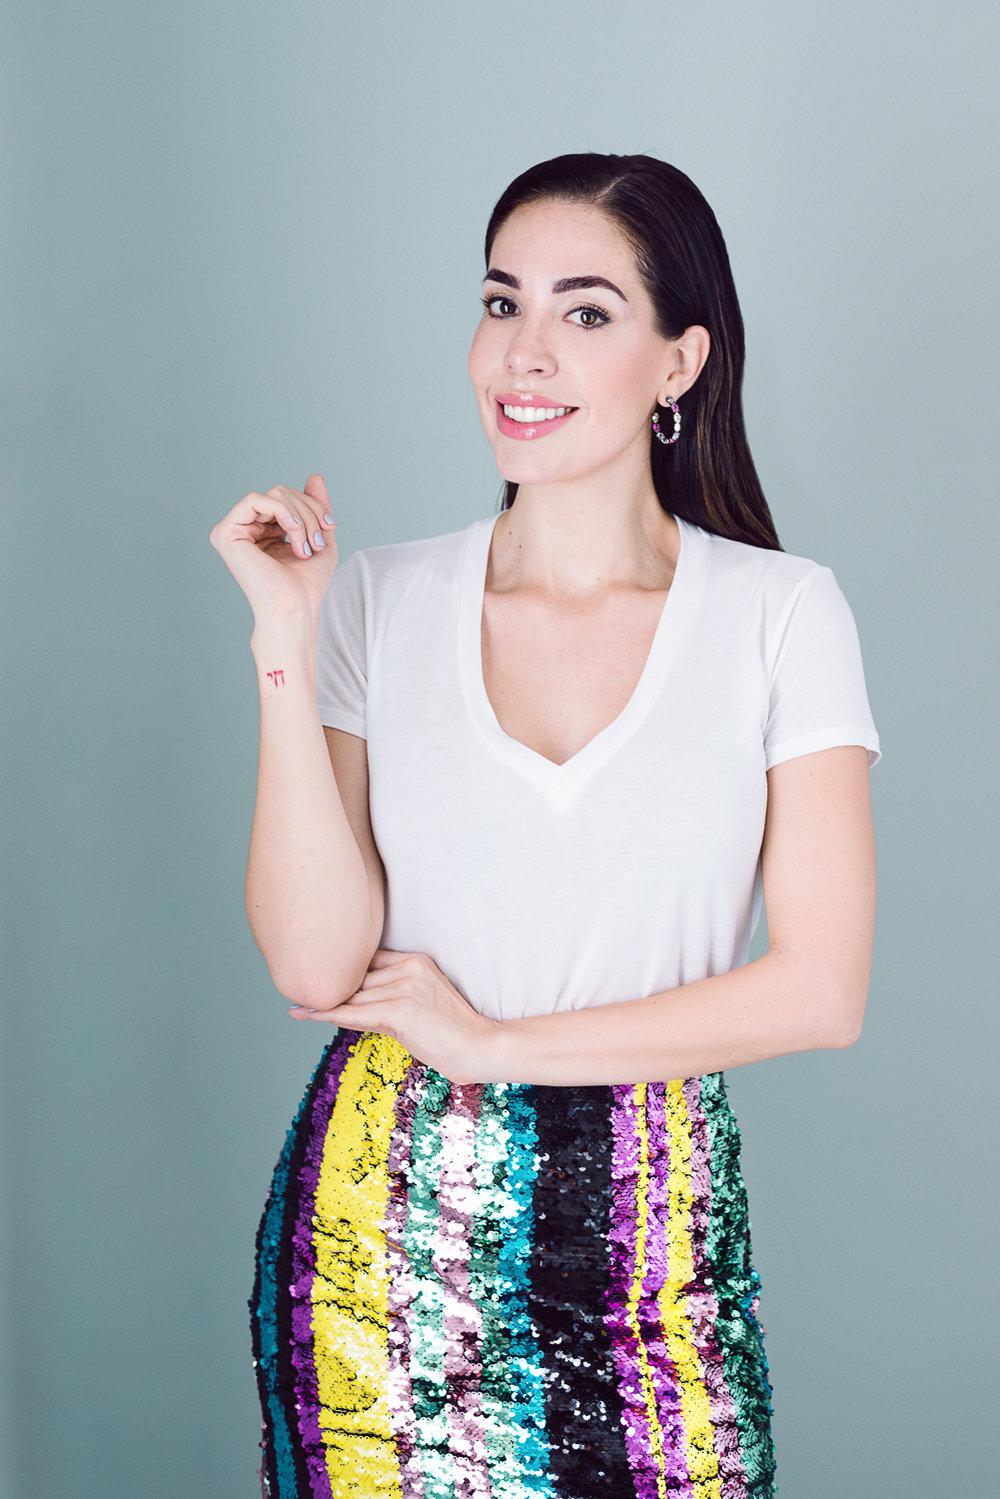 Diva Lomas-Melissa Alcantar Fotografia Sesión de fotos